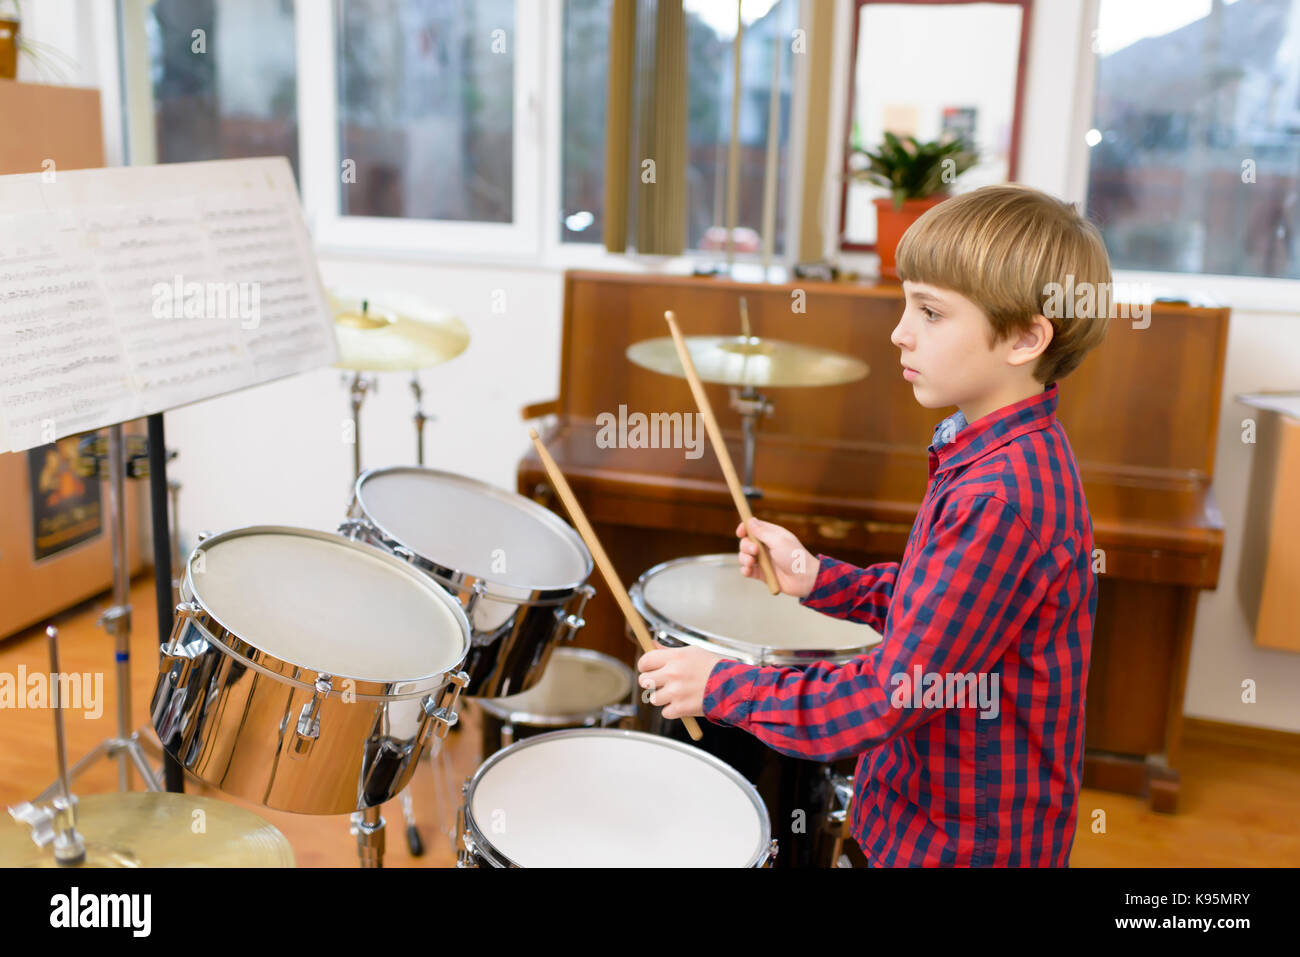 White Room Drums Rock School